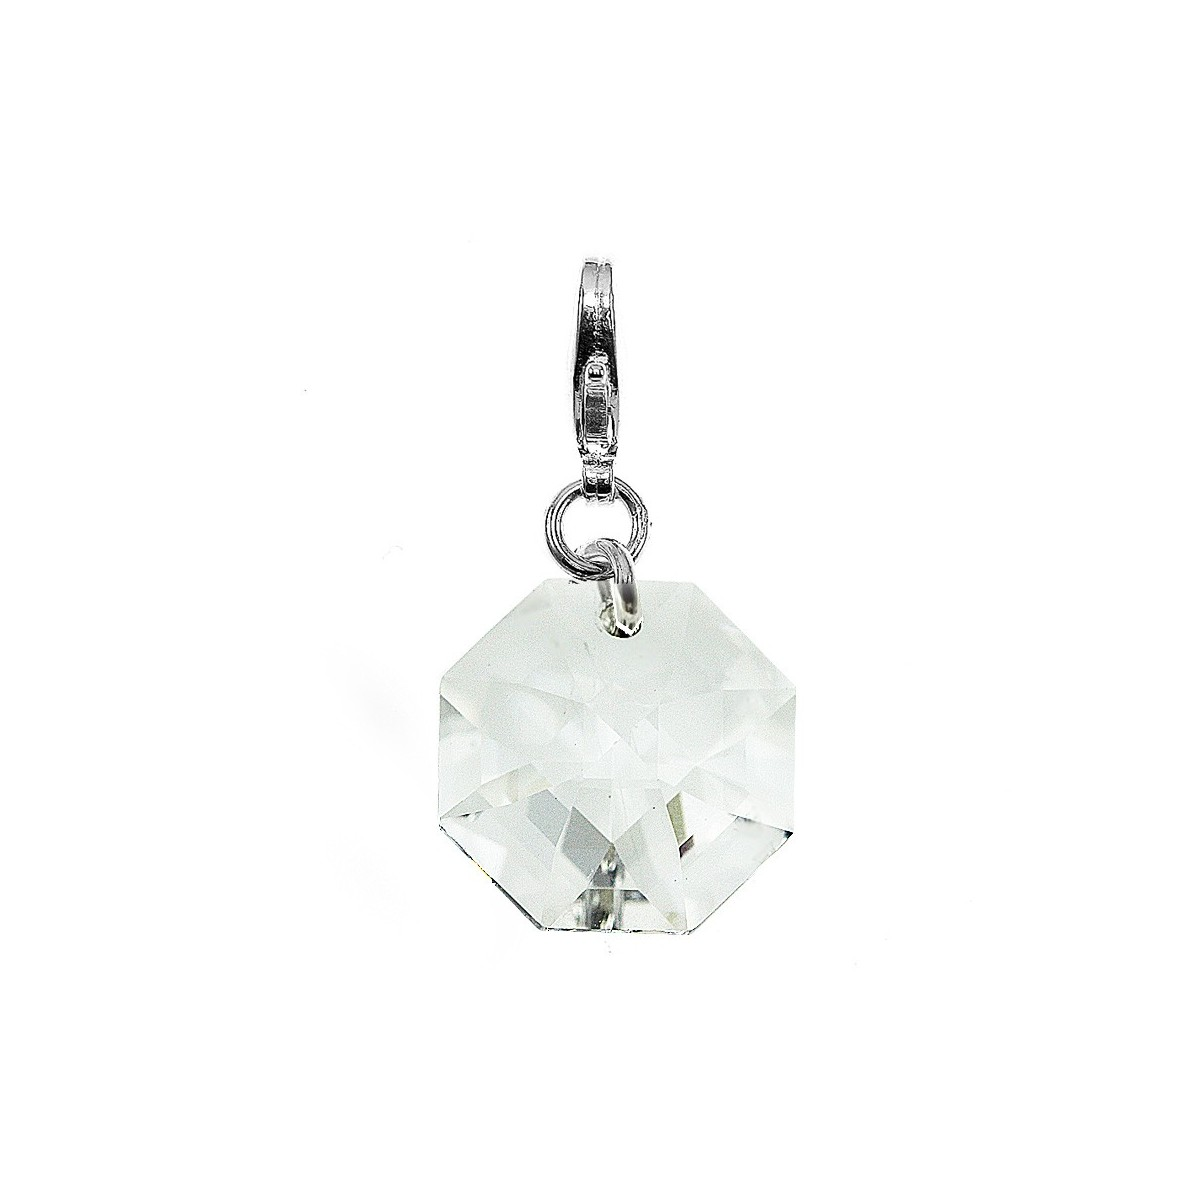 Charm made with Crystal from Swarovski par So Charm